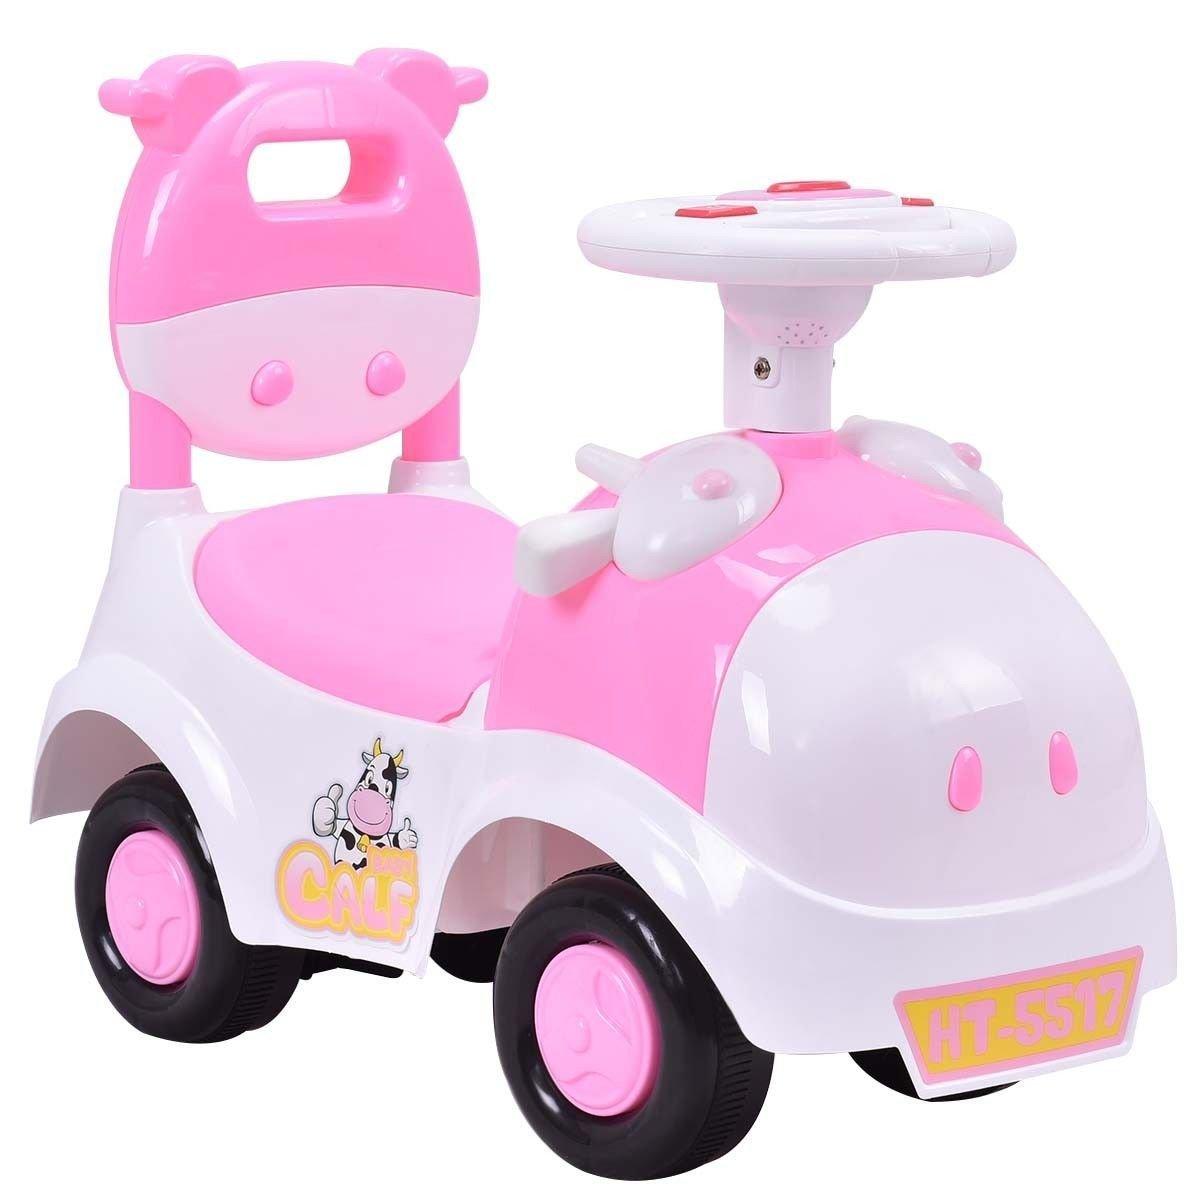 Costzon Kids Ride On Push Car, 3 in 1 Sliding Car Pushing Cart, Toddlers Ride On Toy w/ Working Horn & Music (Pink)